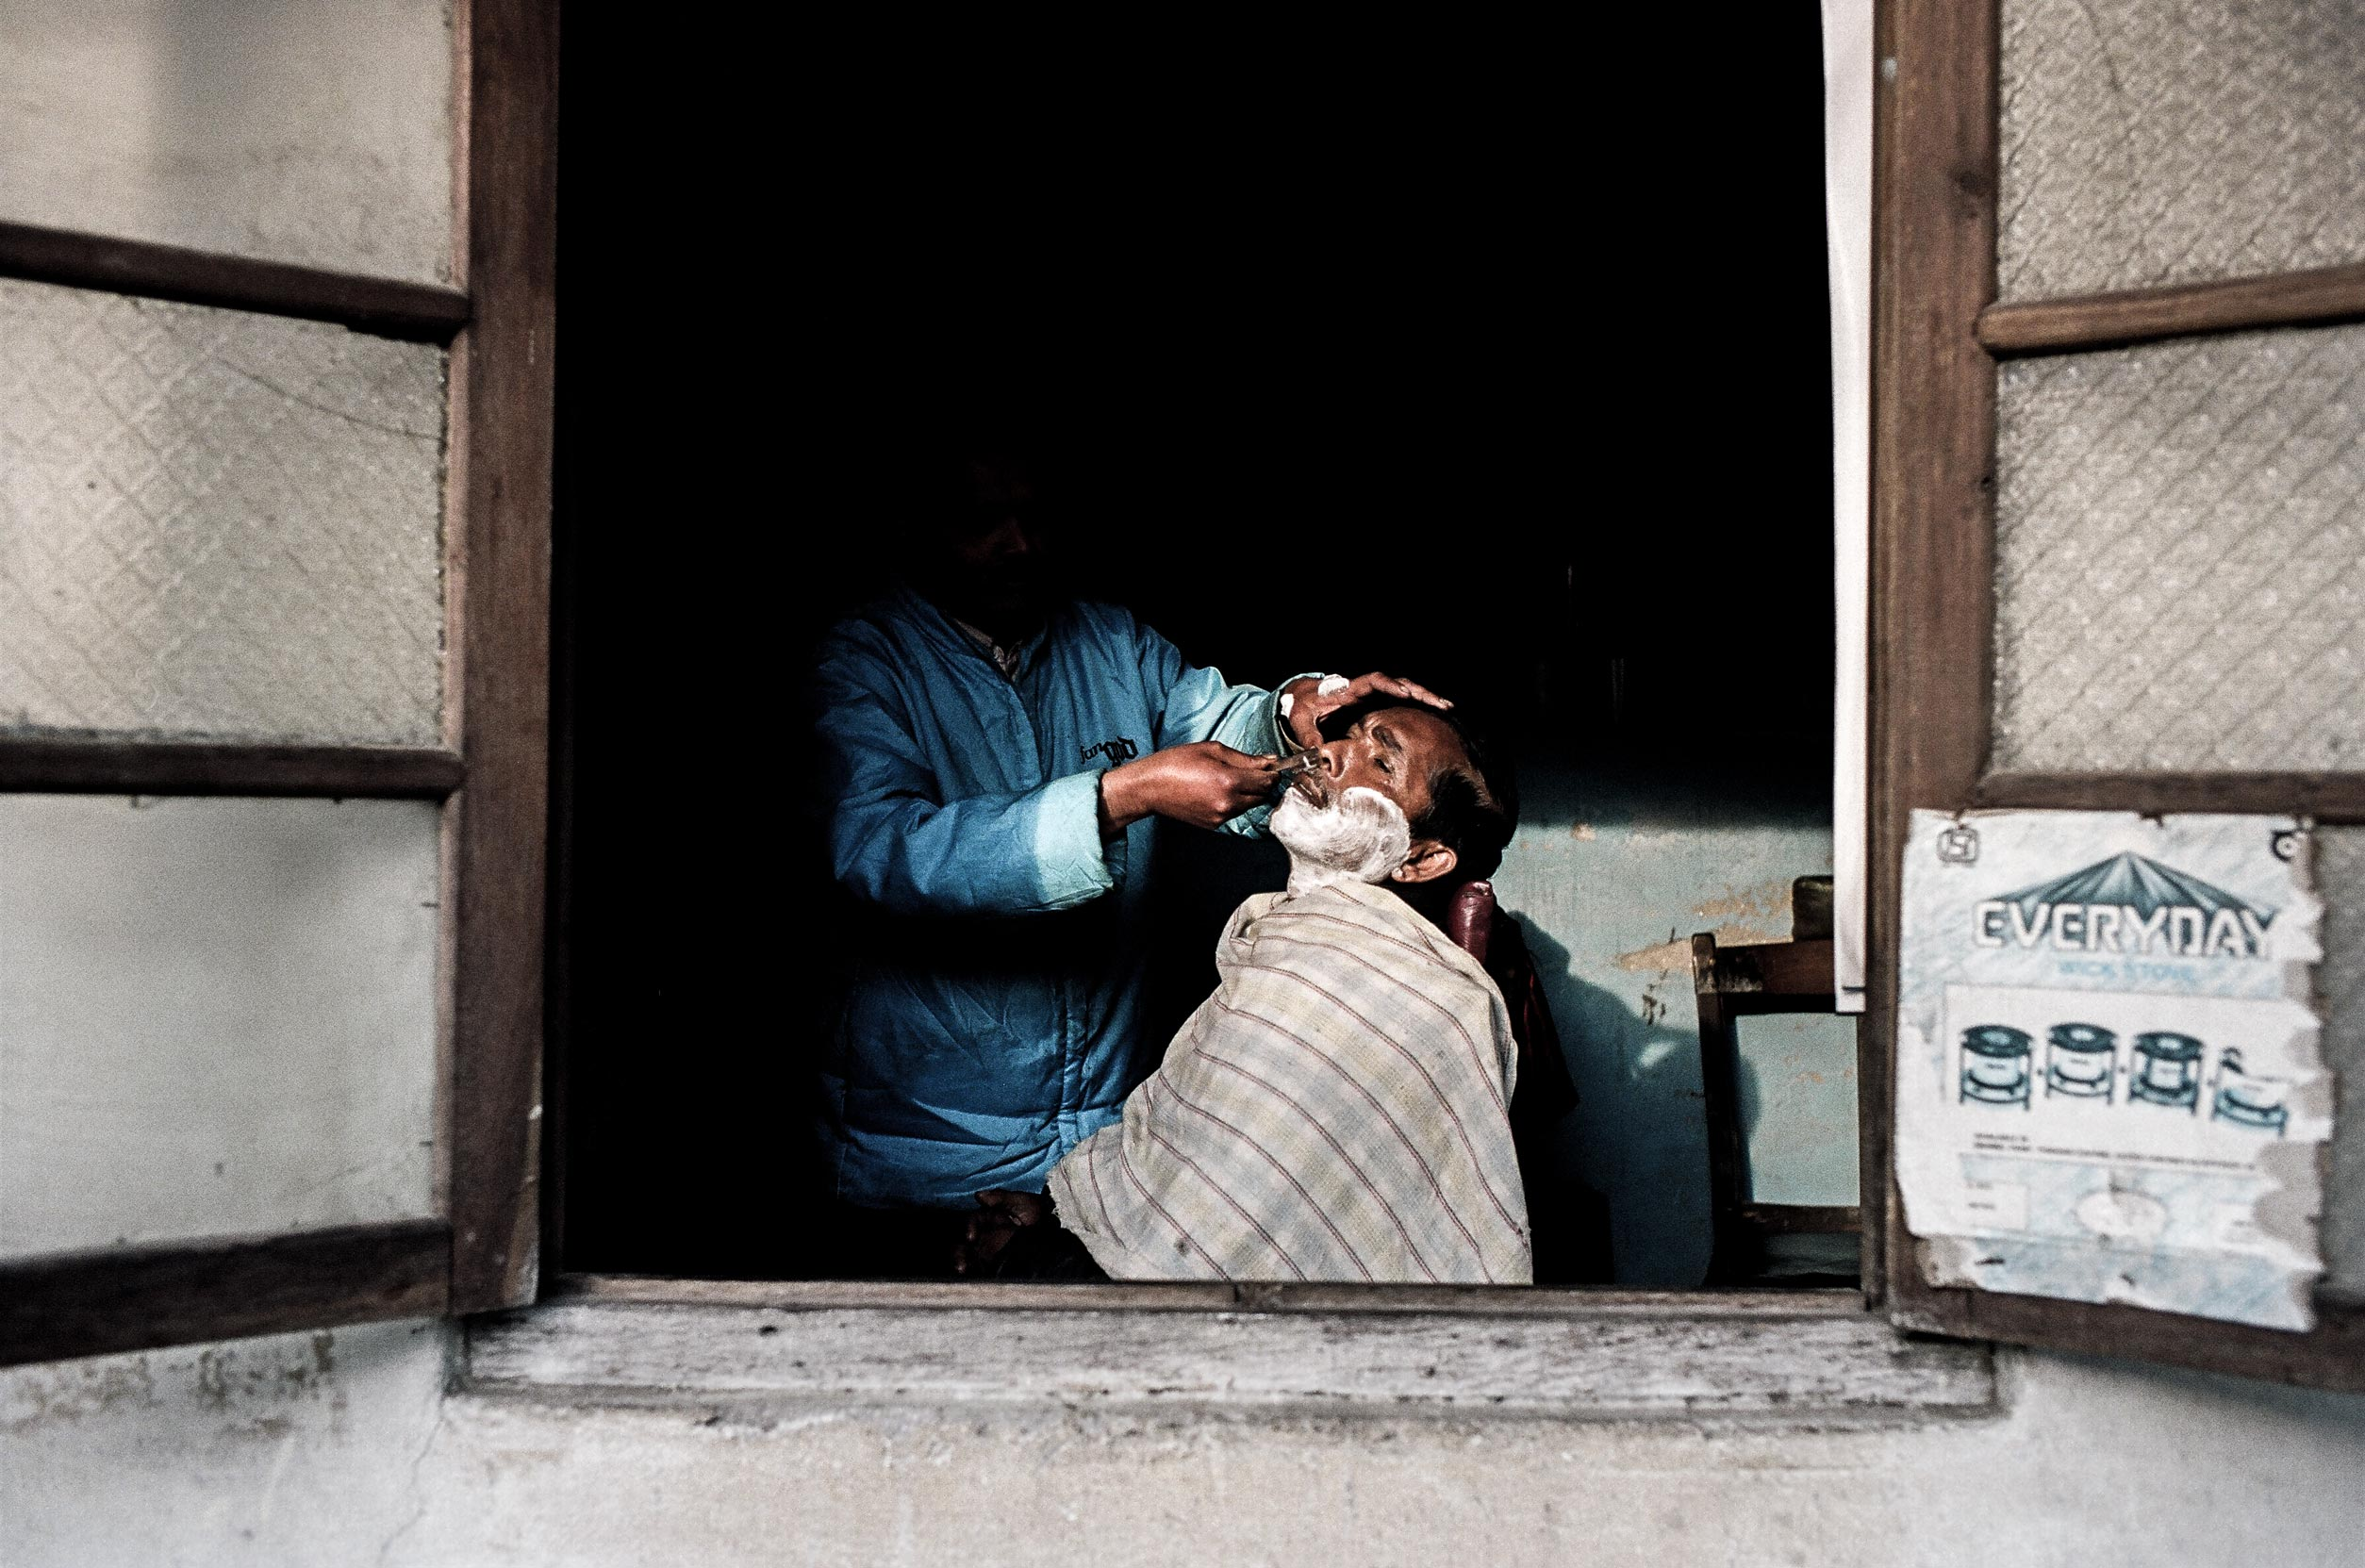 Daniel_Zvereff-india-shave-78380014